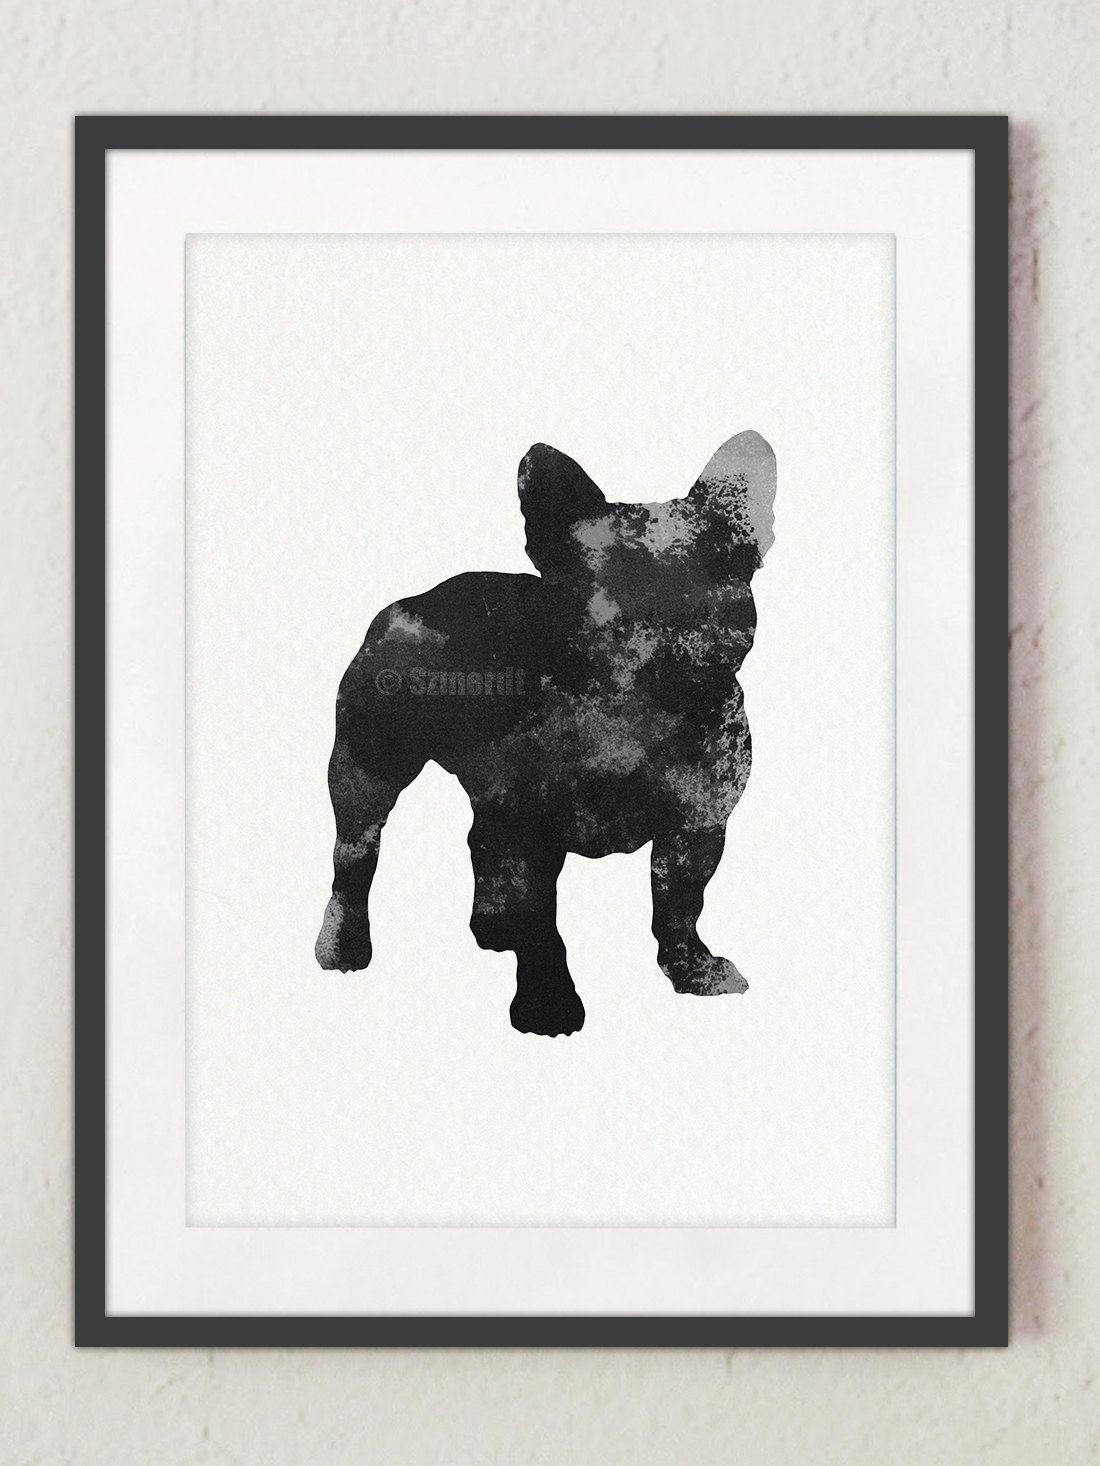 French Bulldog, Dog silhouette, Black dog poster, Dog wall